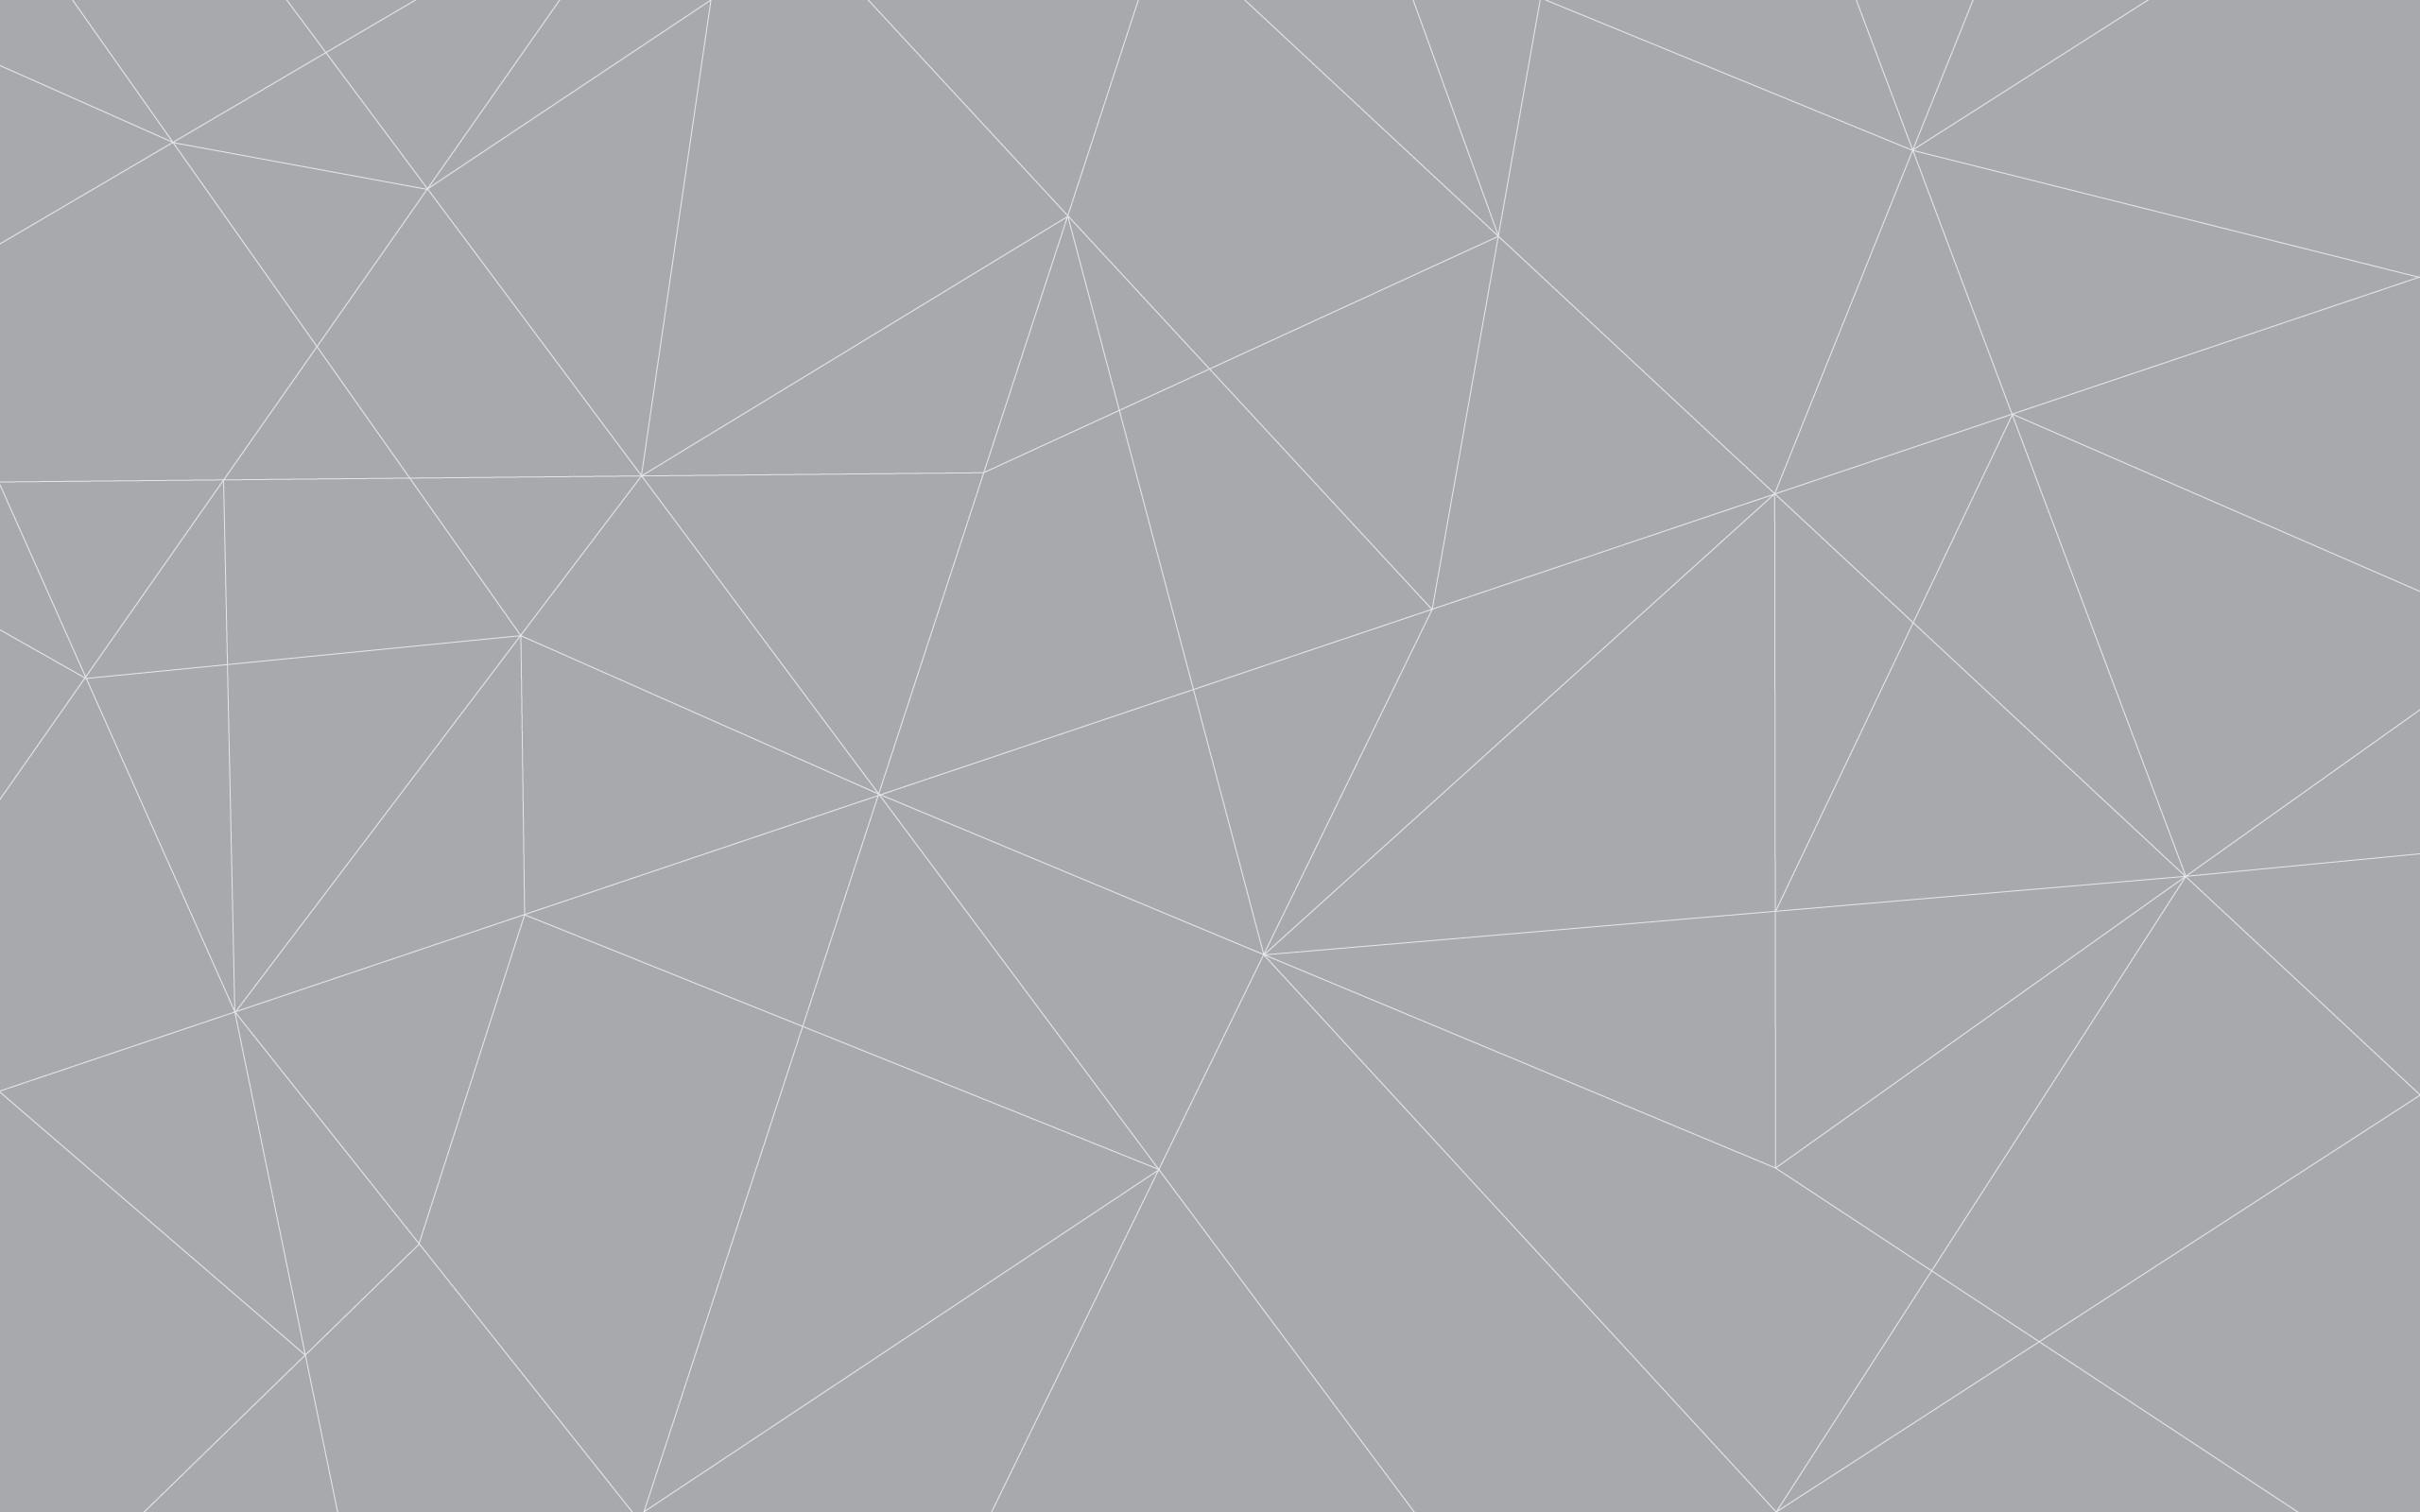 76 Geometric Desktop Wallpapers on WallpaperPlay 2560x1600